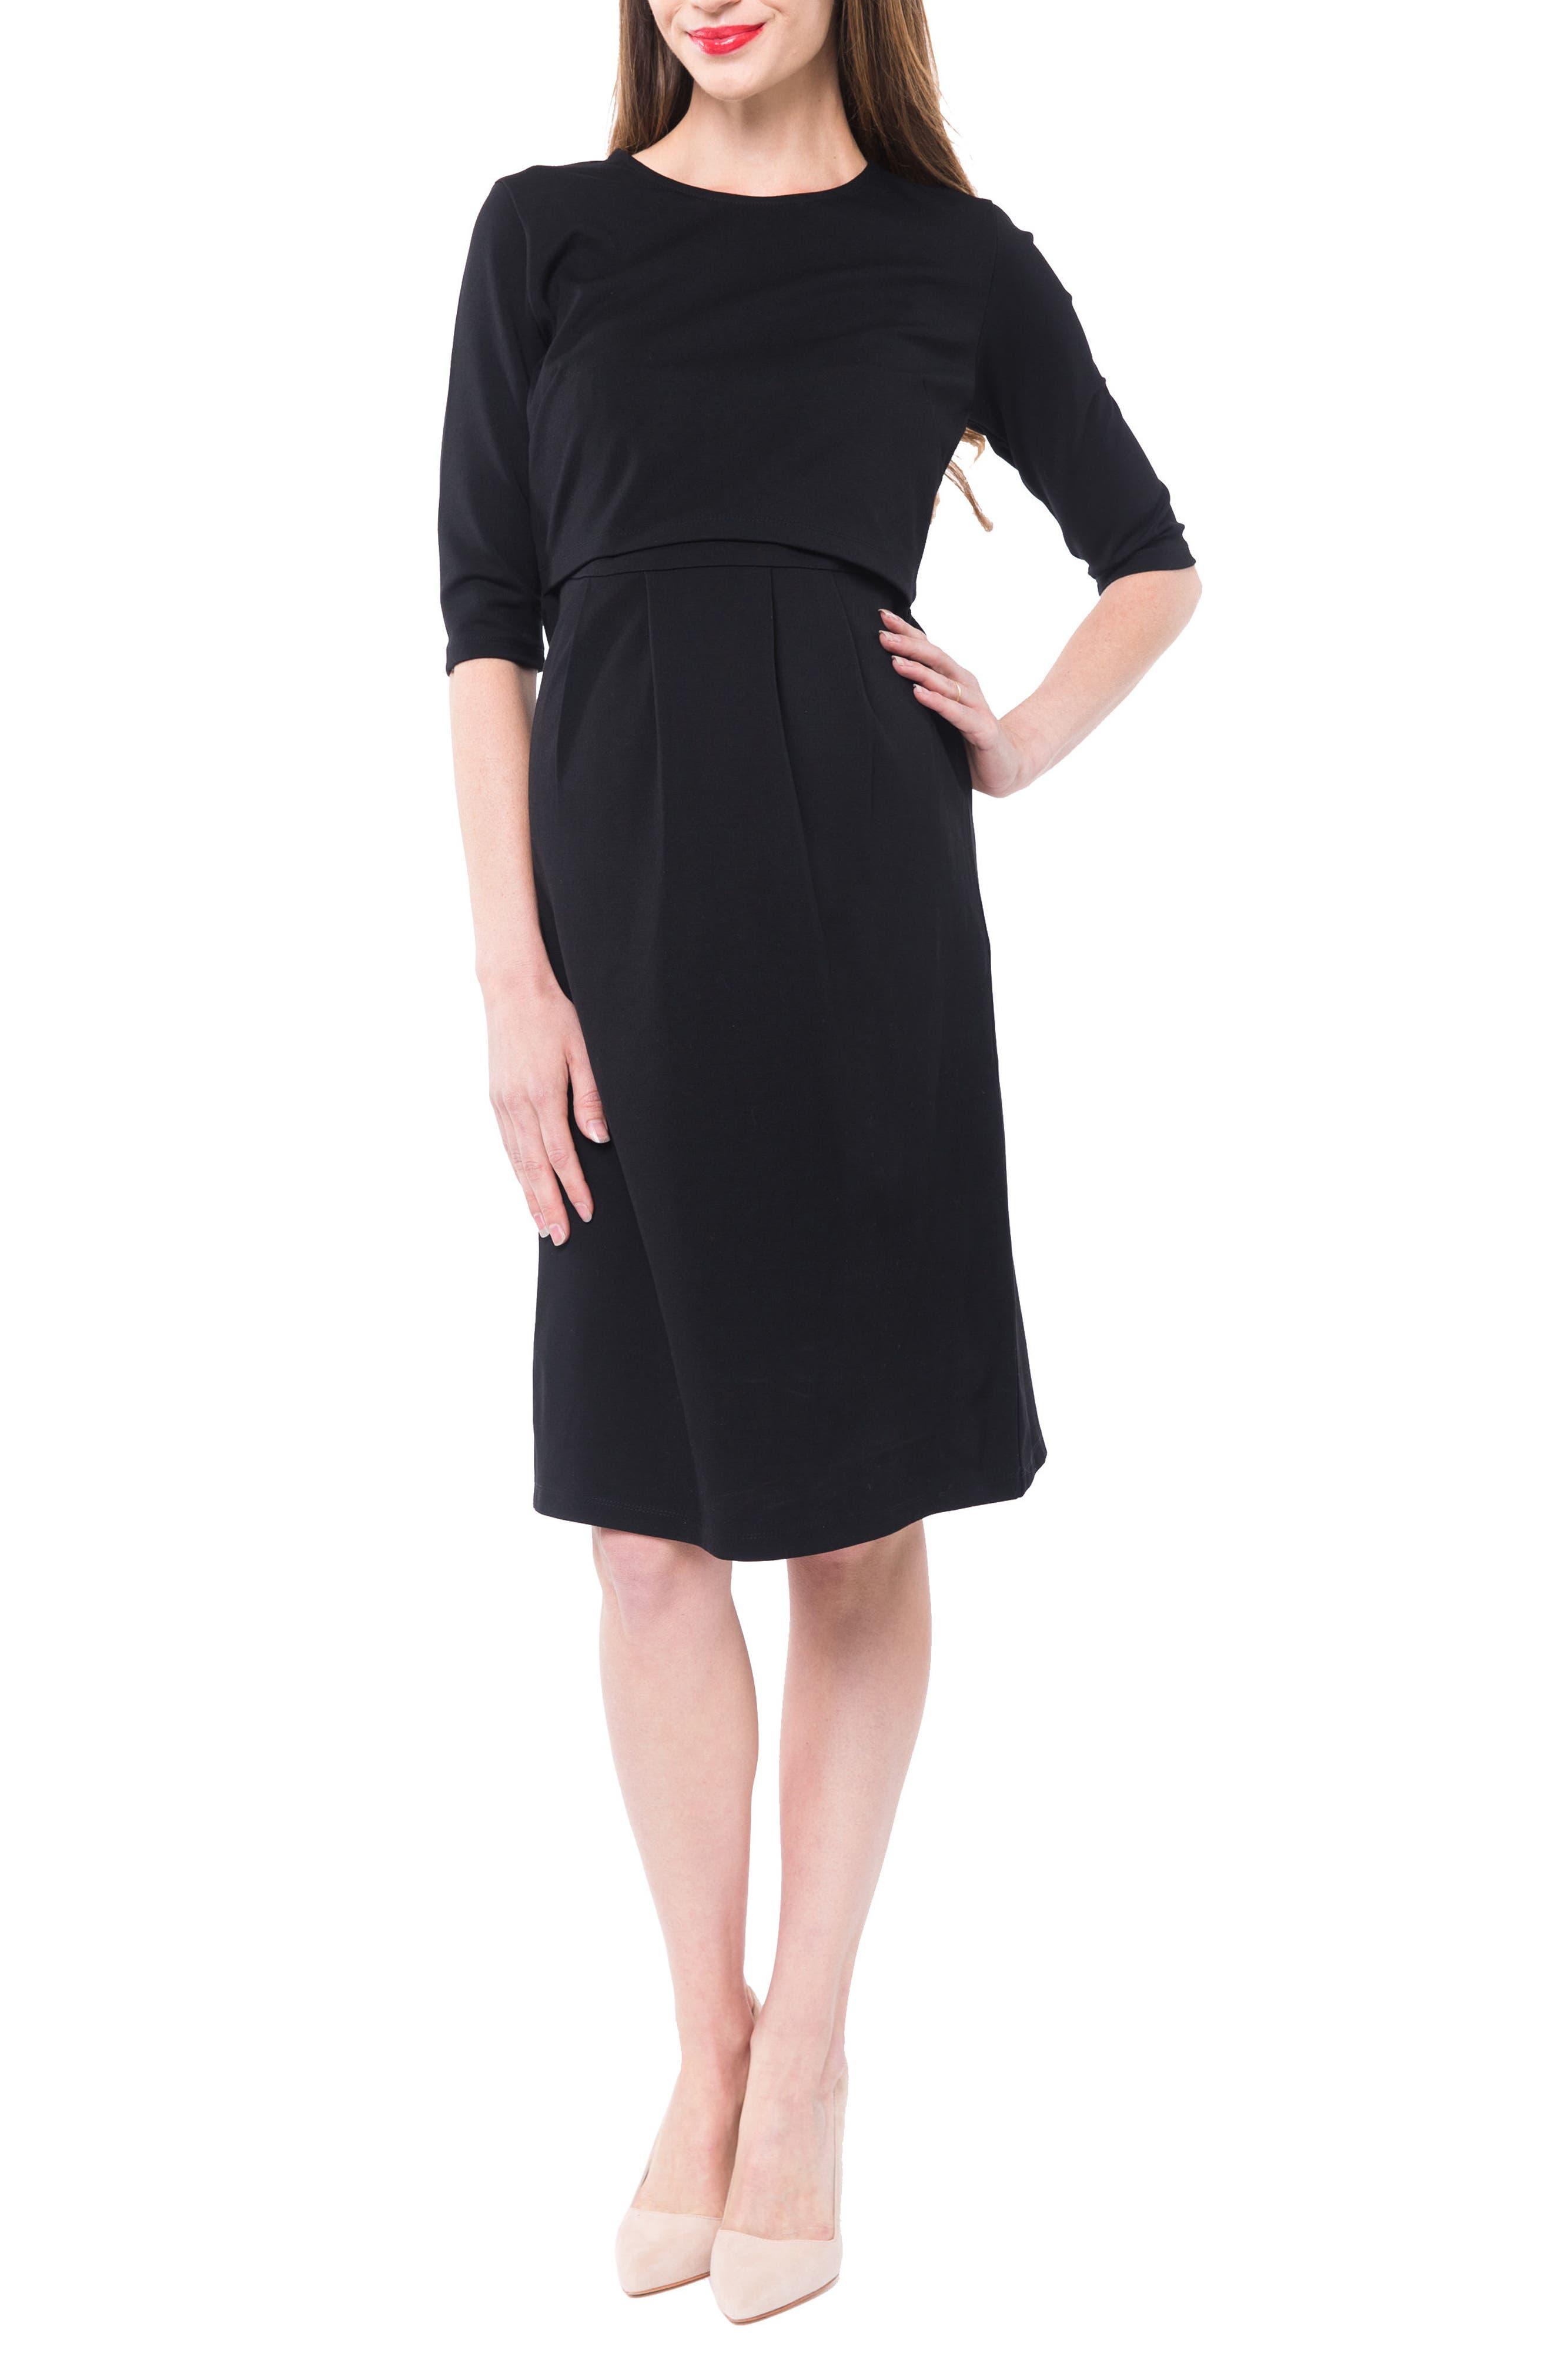 Nom Maternity Valentina Ponte Knit Maternity/nursing Dress